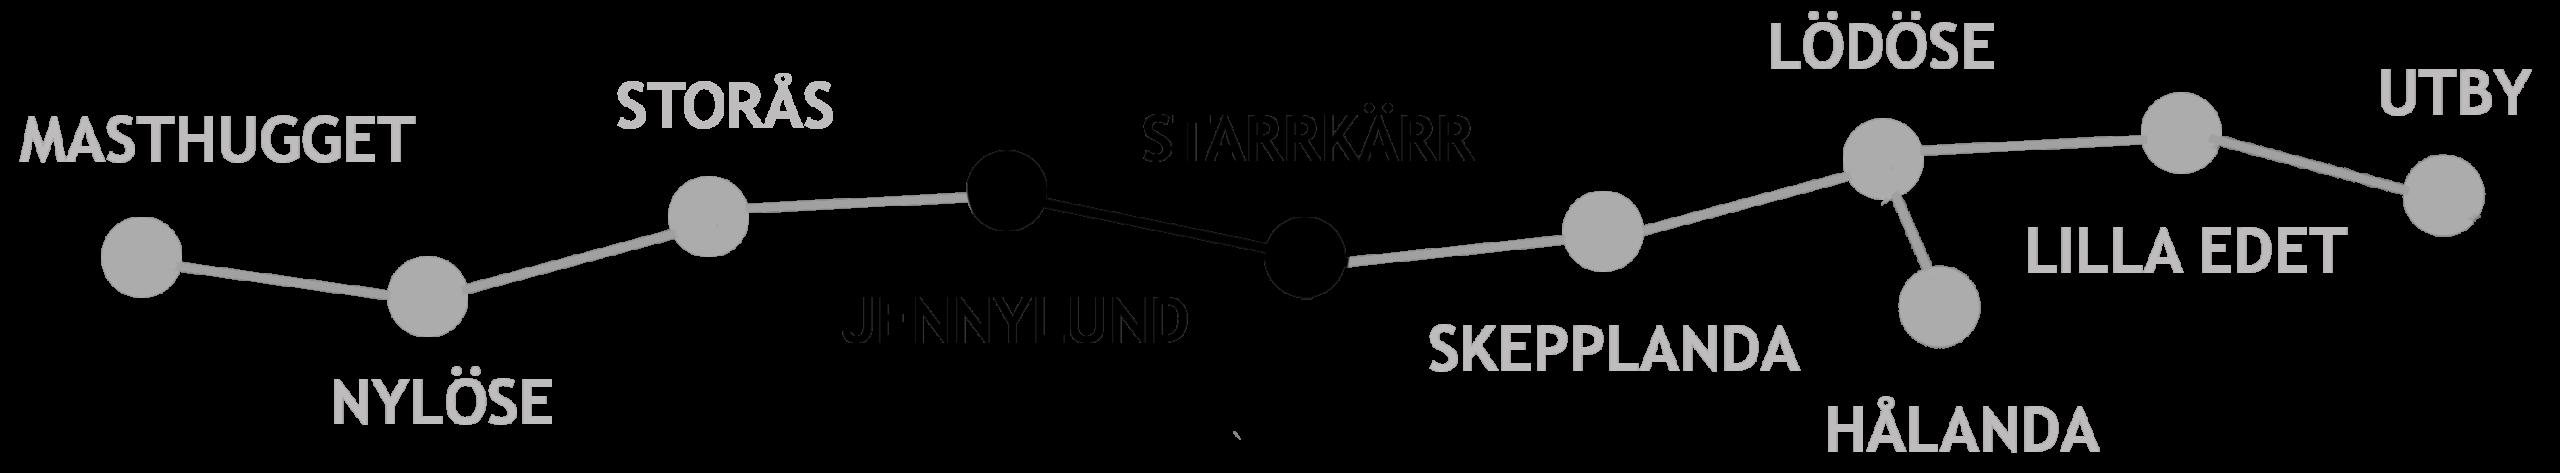 ETAPP 4: JENNYLUND – STARRKÄRR